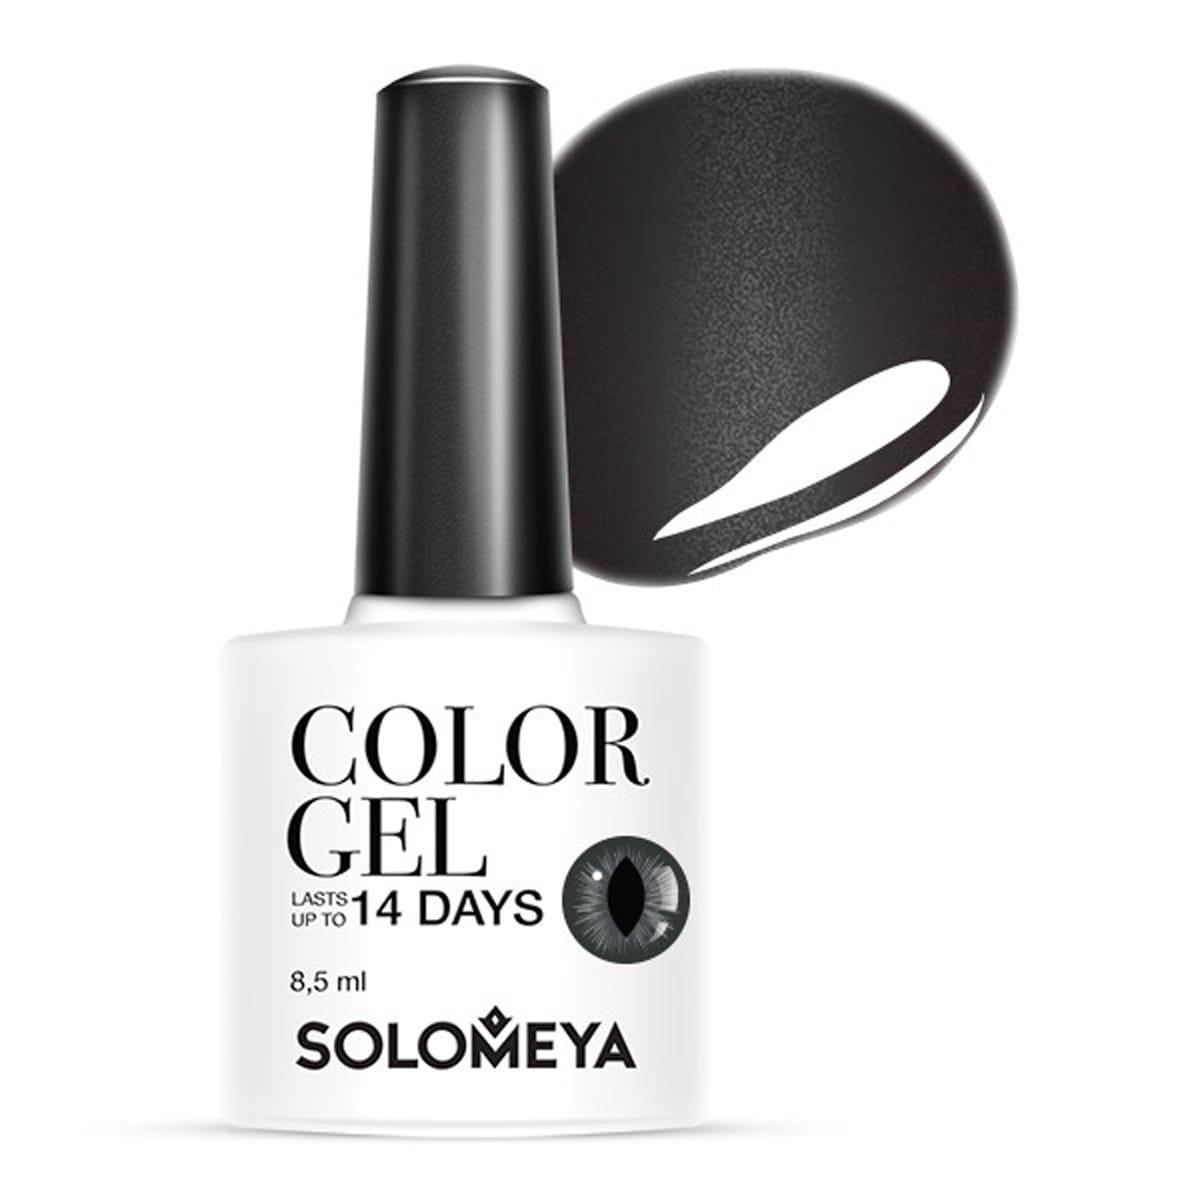 SOLOMEYA Гель-лак для ногтей SCE031 Кошачий глаз, дикий серый / Cat Eye Gel Wild Grey 8,5 мл цена